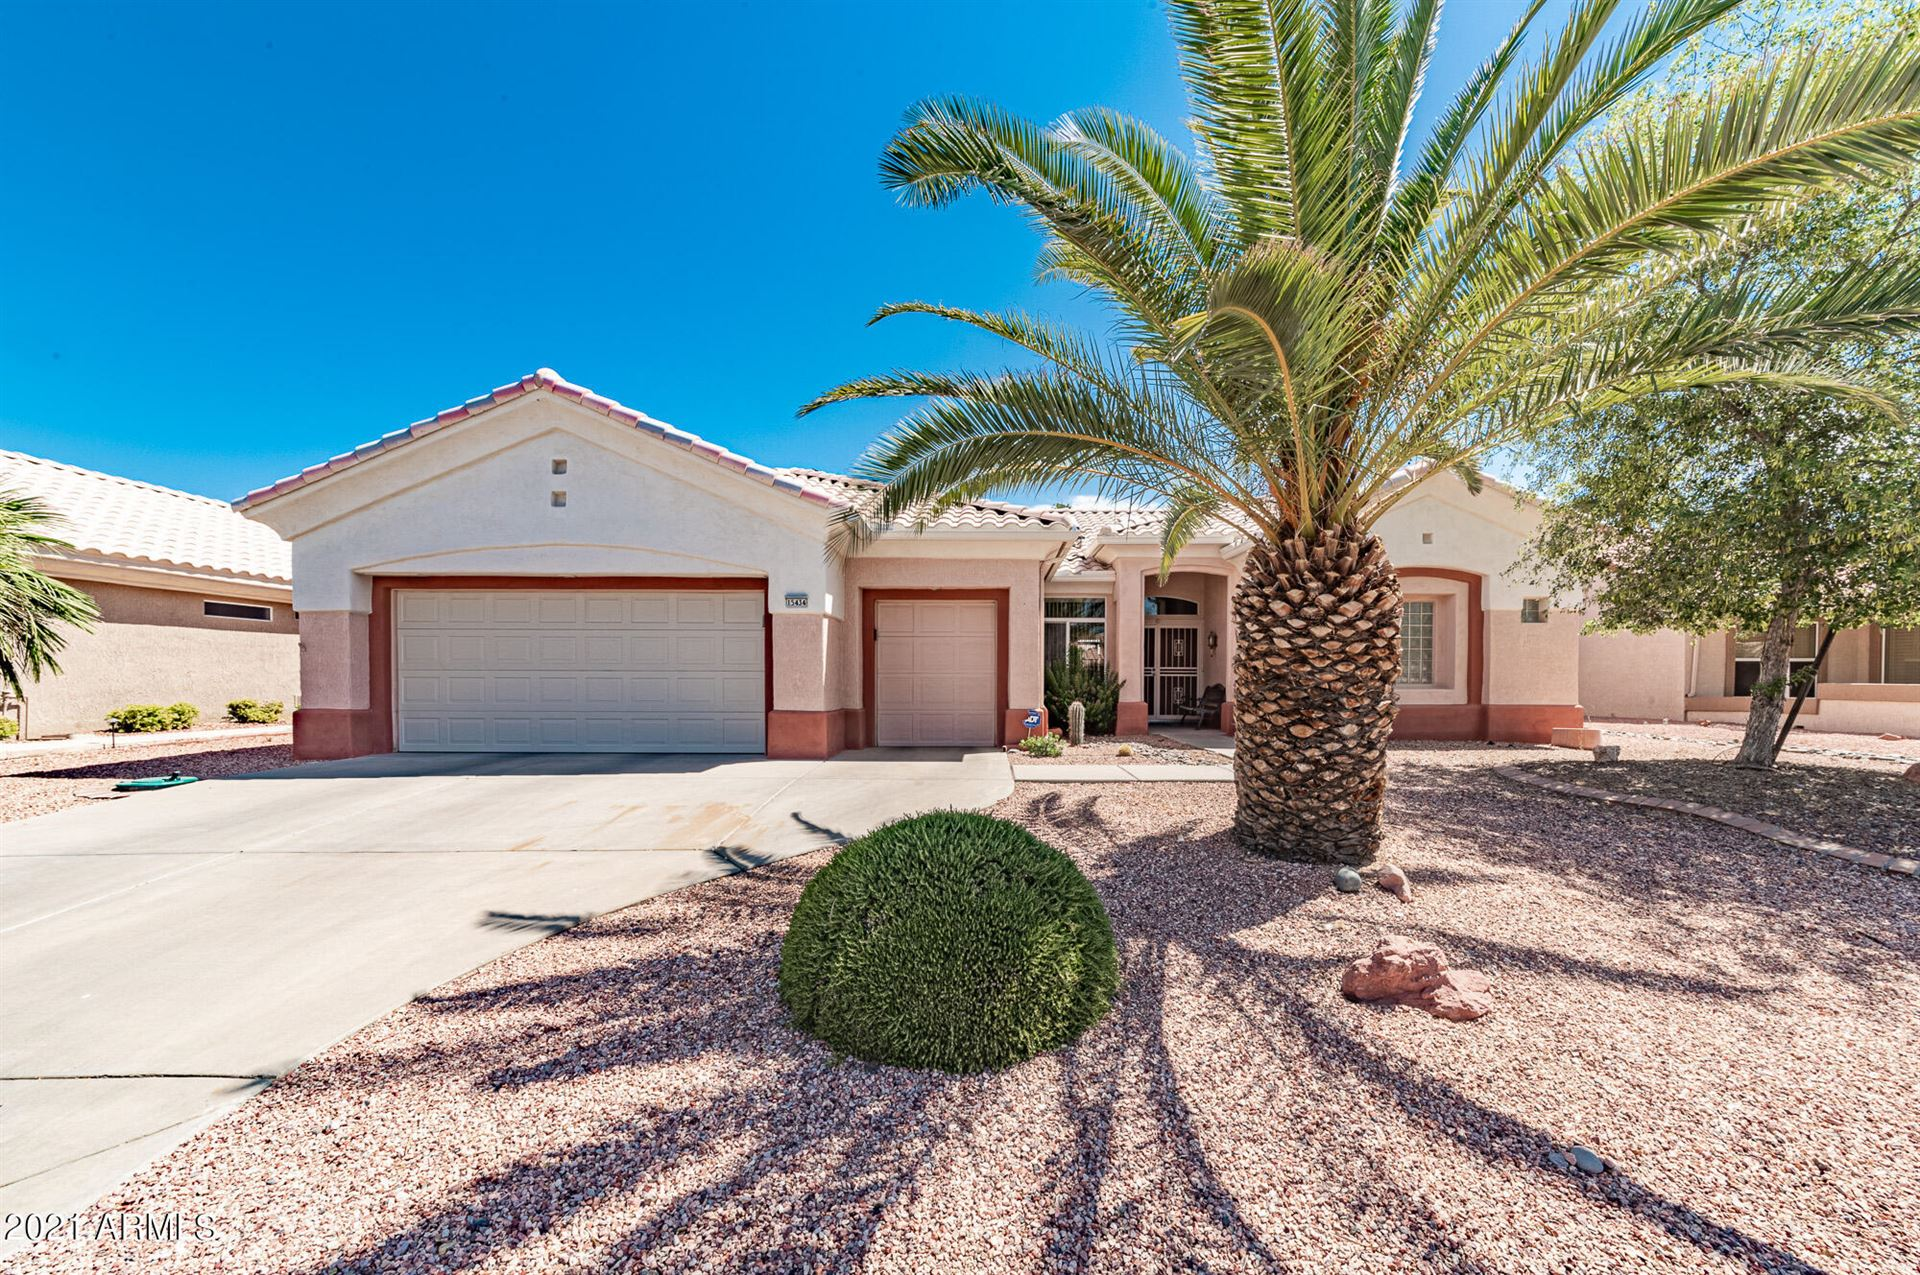 15434 W GUNSIGHT Drive, Sun City West, AZ 85375 - MLS#: 6246587